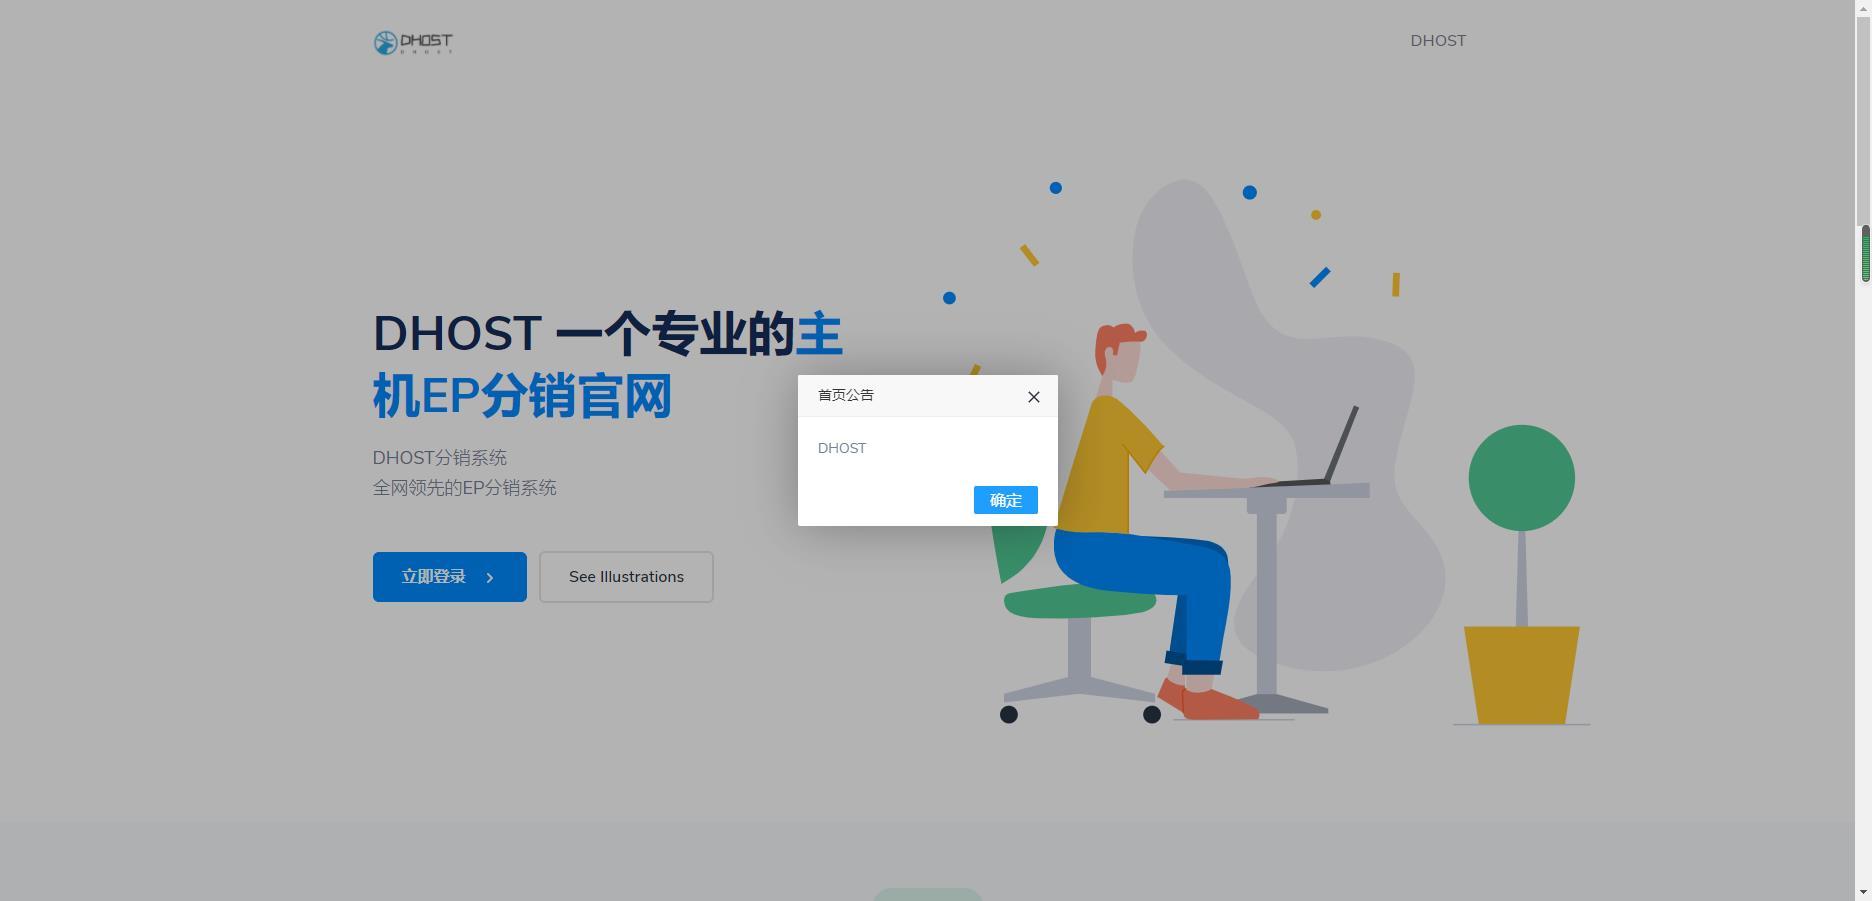 DHPST分销系统 EP分销云主机分销系统源码